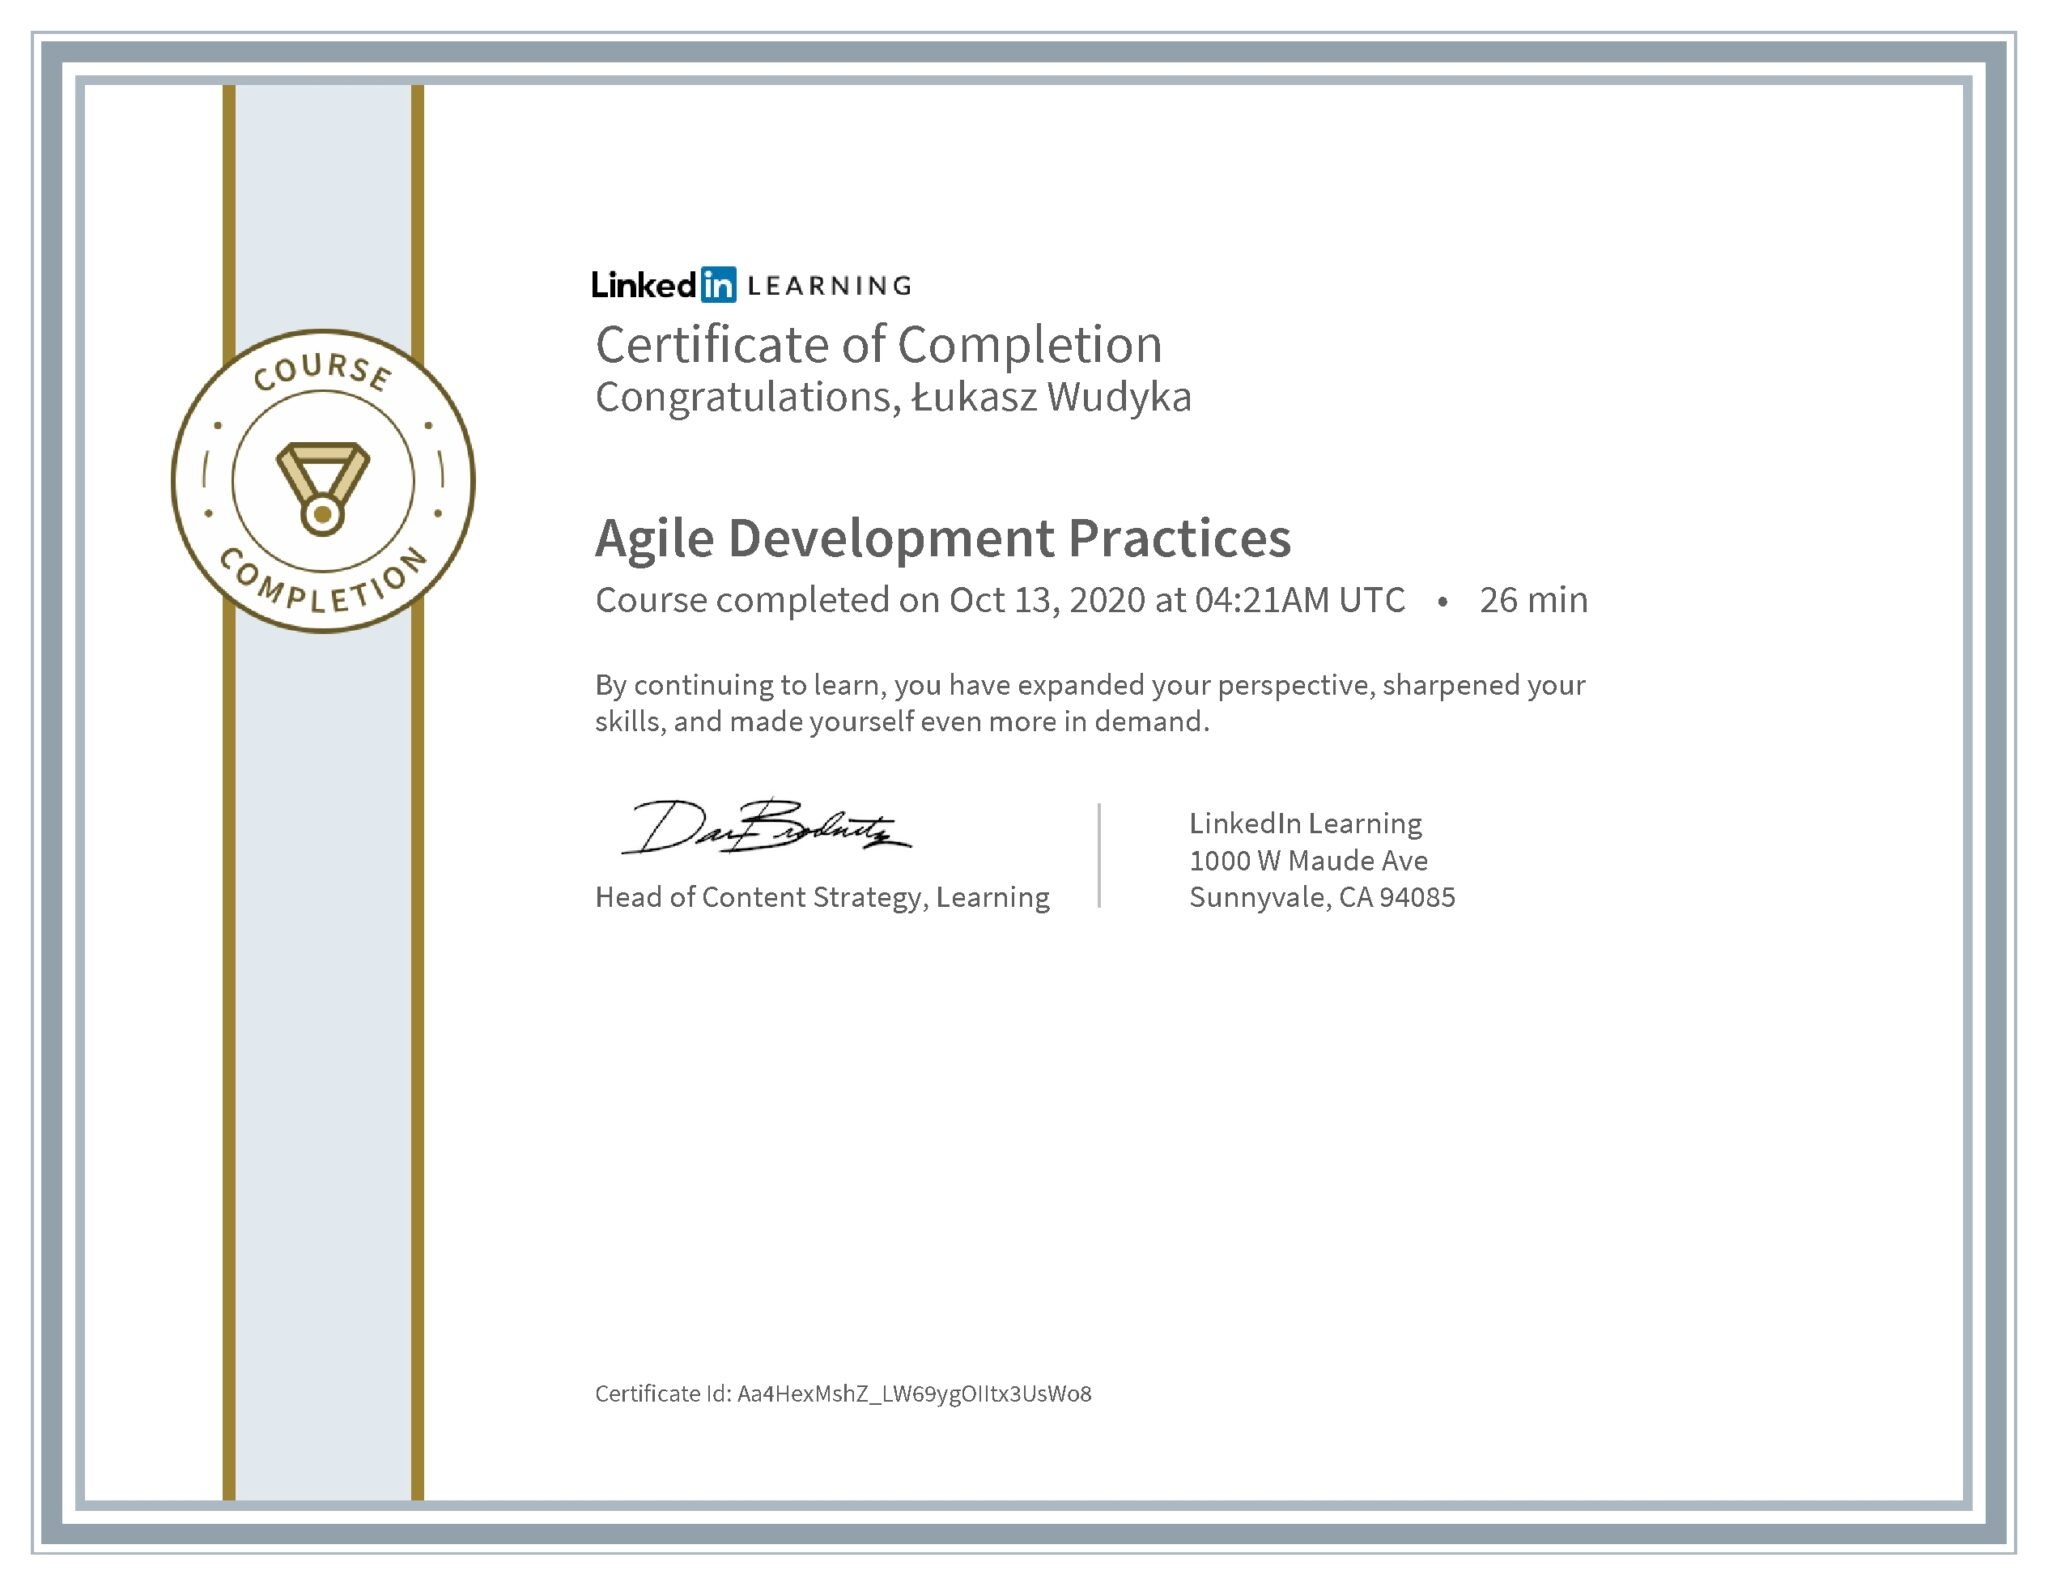 Łukasz Wudyka certyfikat LinkedIn Agile Development Practices